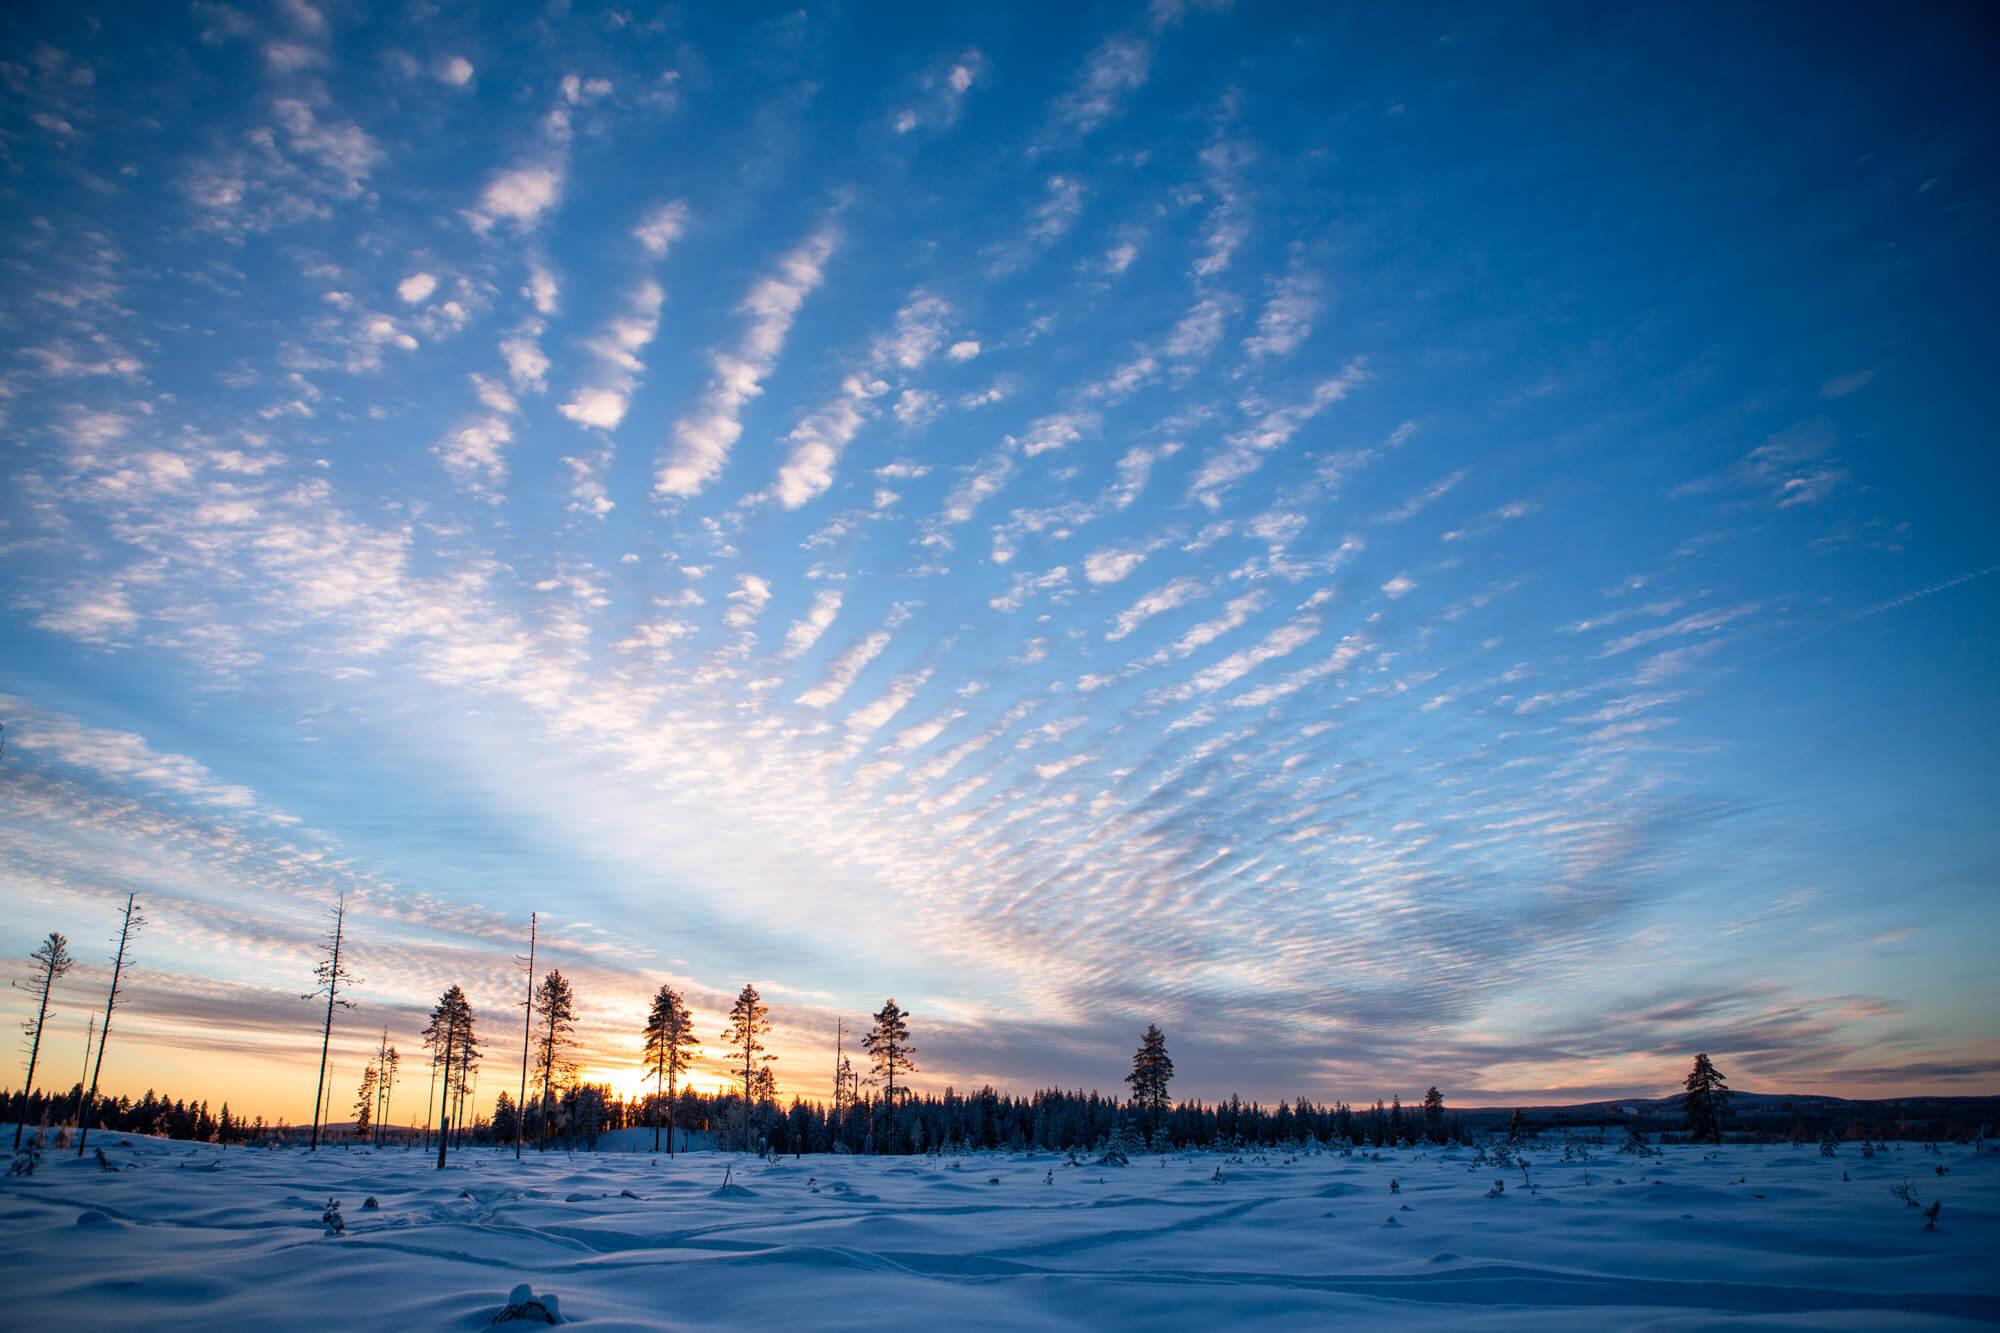 Winter sunset in Swedish Lapland